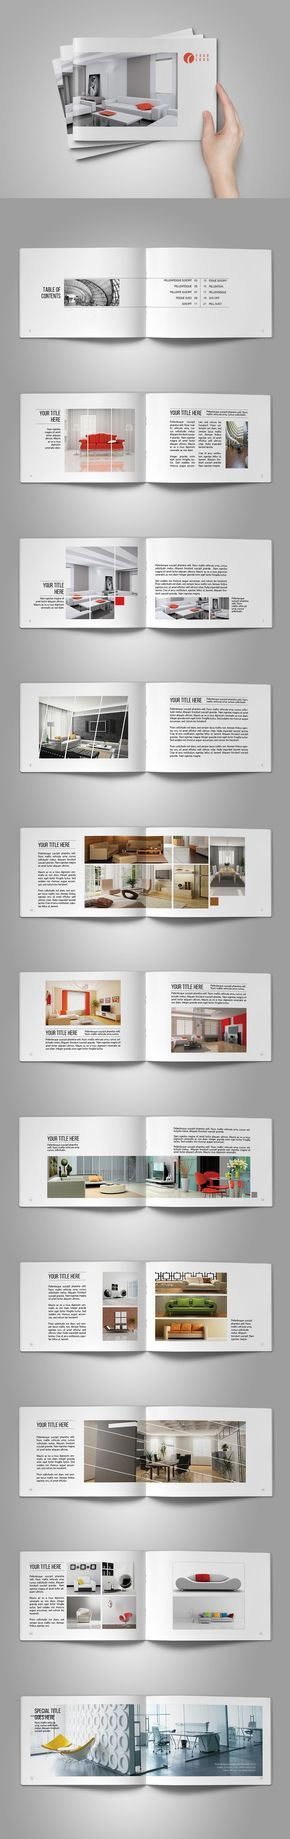 Interior Design Brochure Template InDesign INDD - 24 Pages, A5 - interior design brochure template